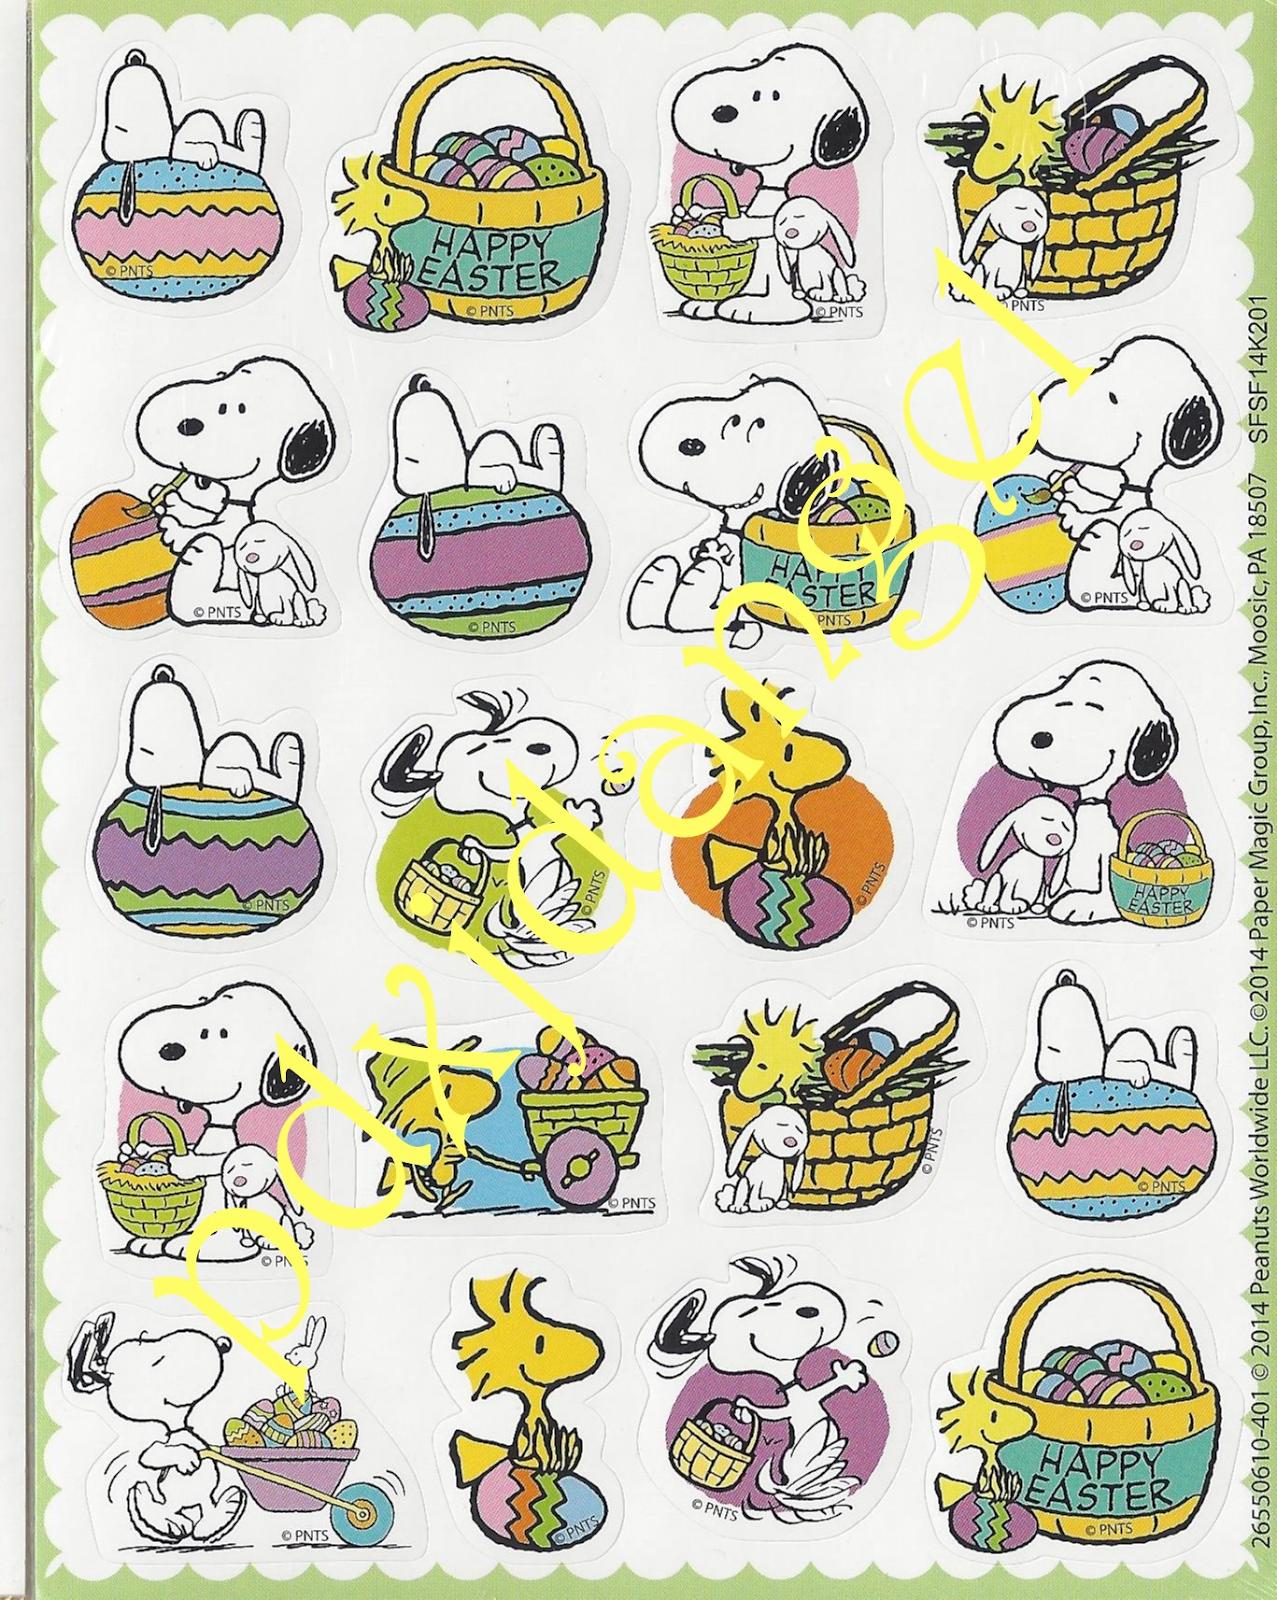 8 Best Ausmalbilder Snoopy images